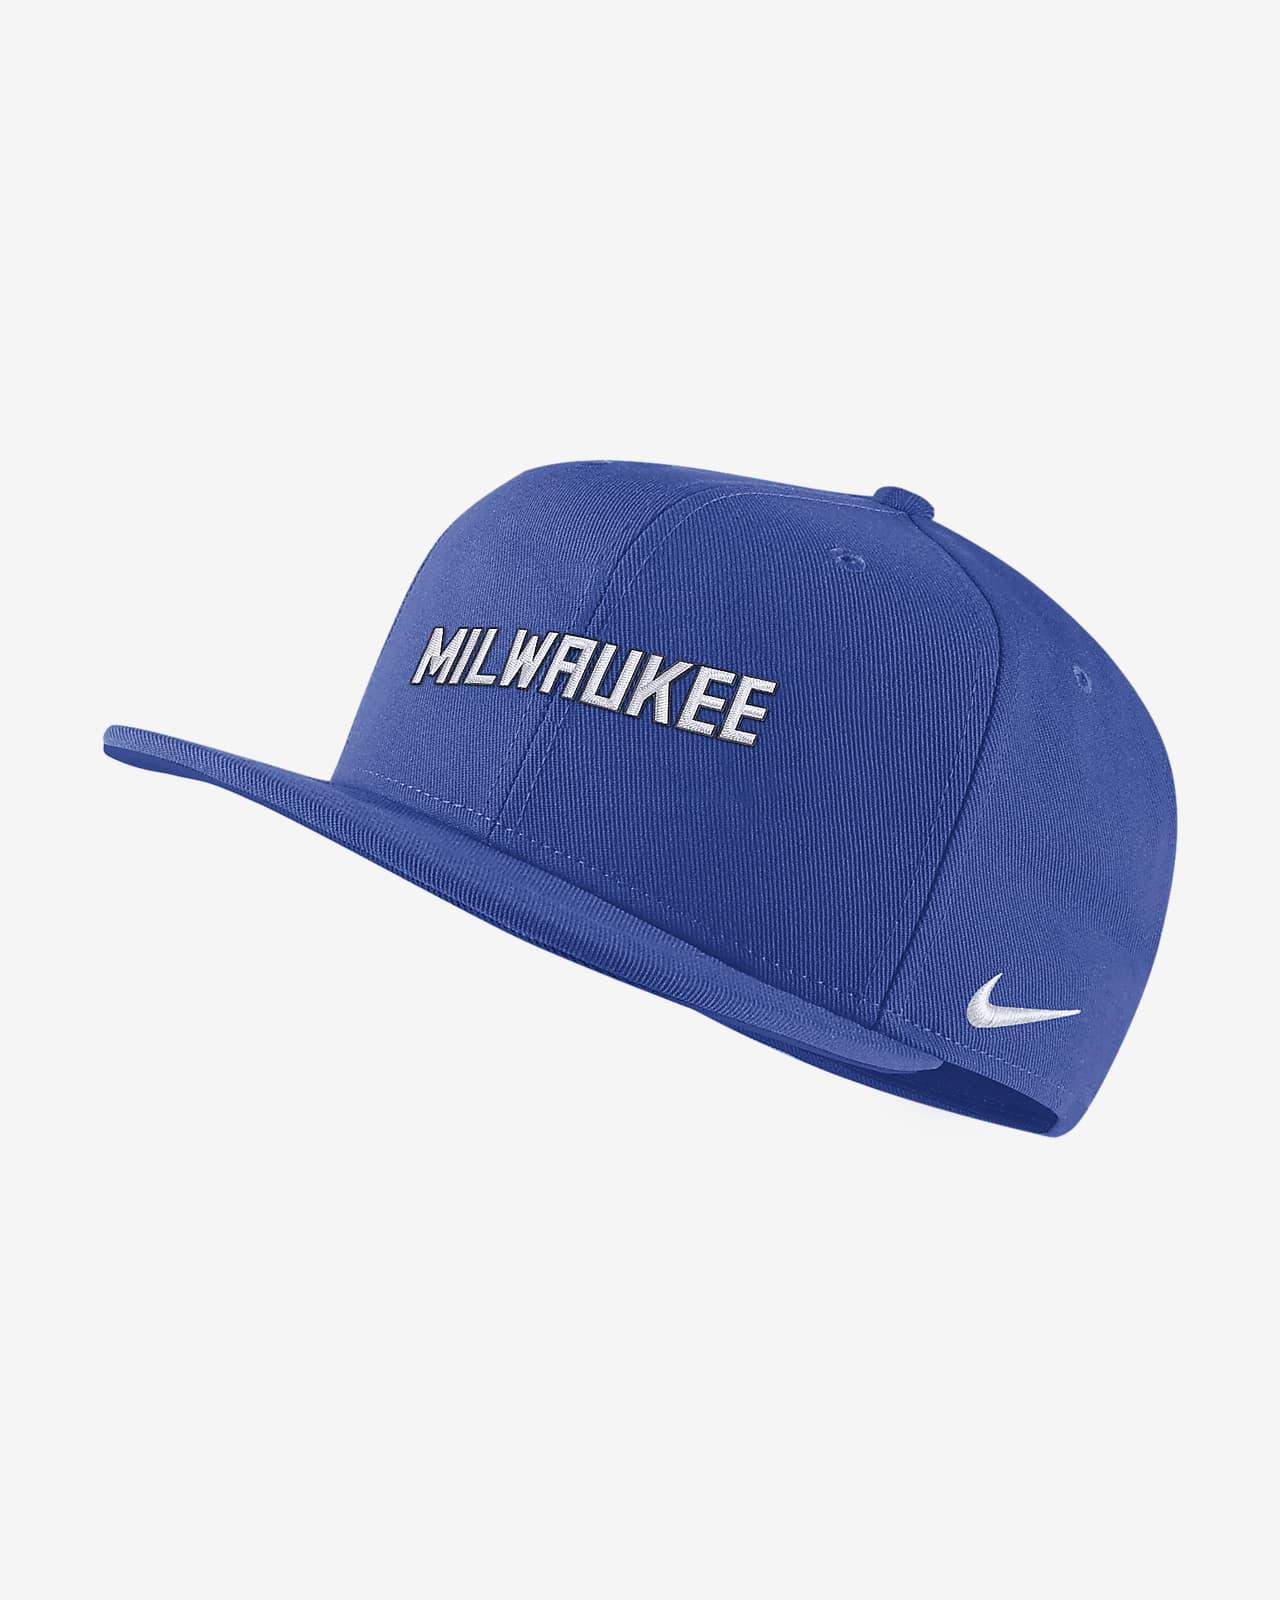 Milwaukee Bucks City Edition Nike Pro NBA Cap